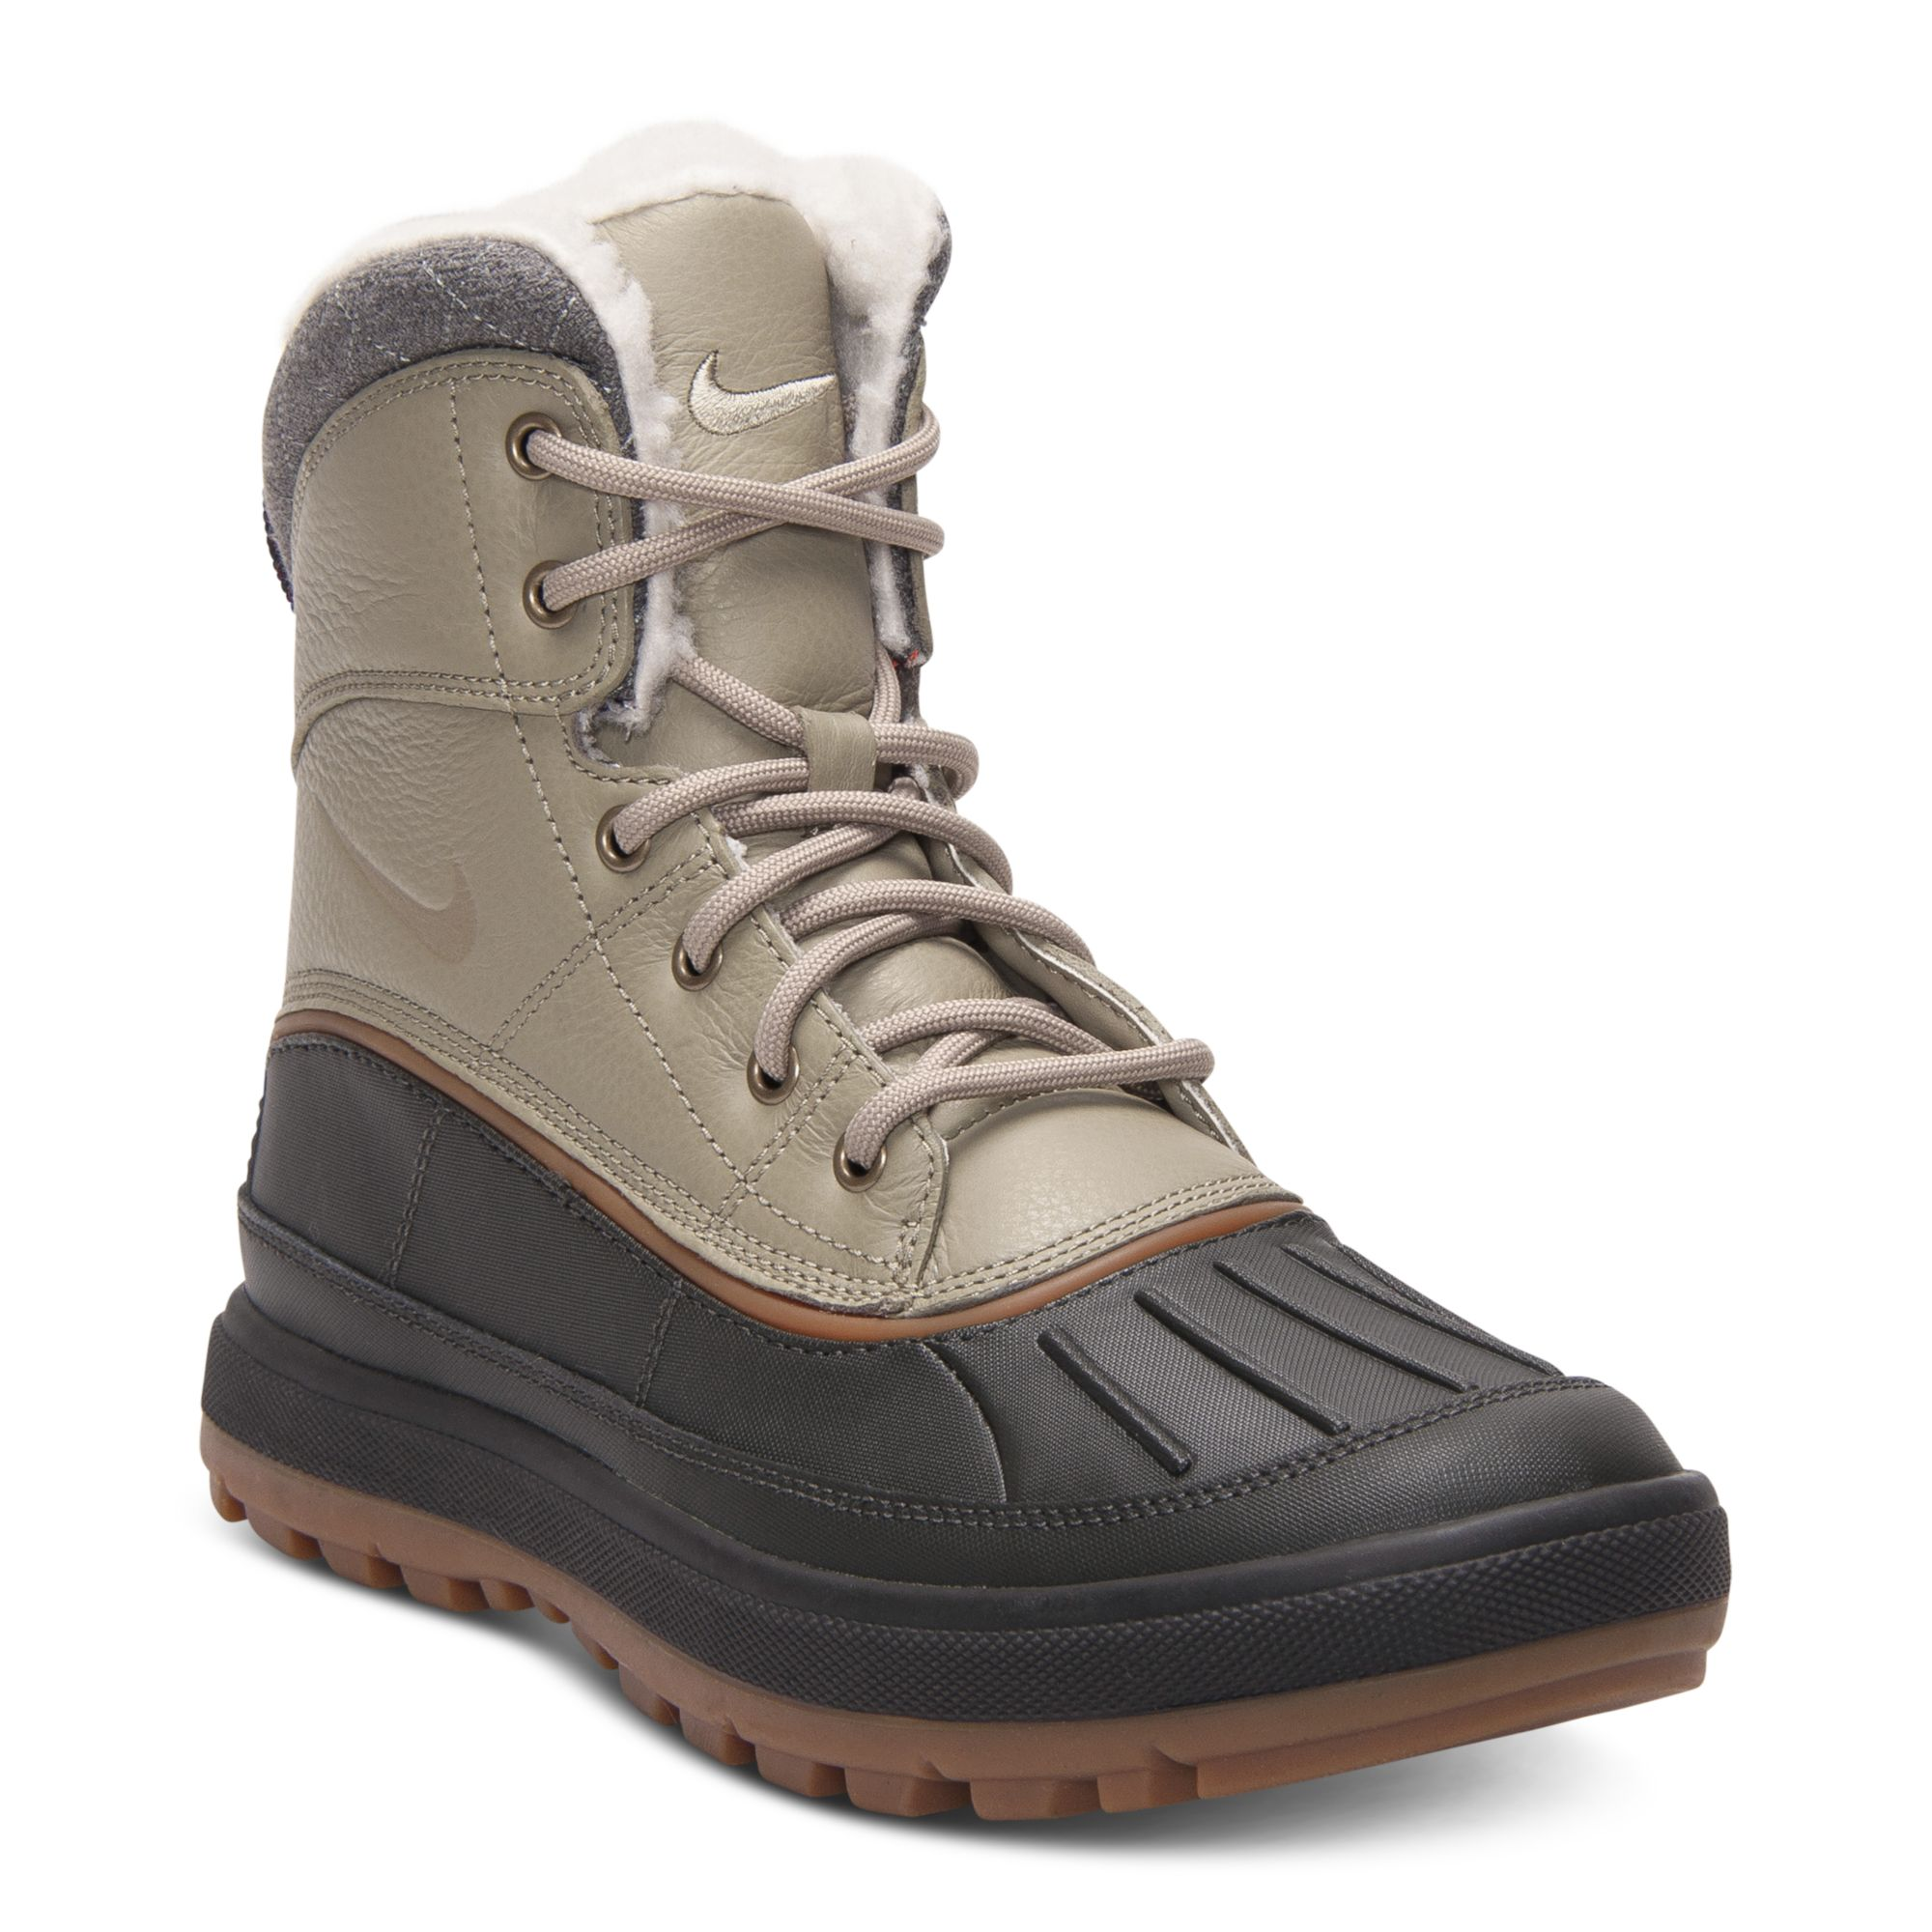 hot sales b81e0 c0d90 Nike Woodside Ii Outdoor Boots in Black for Men - Lyst